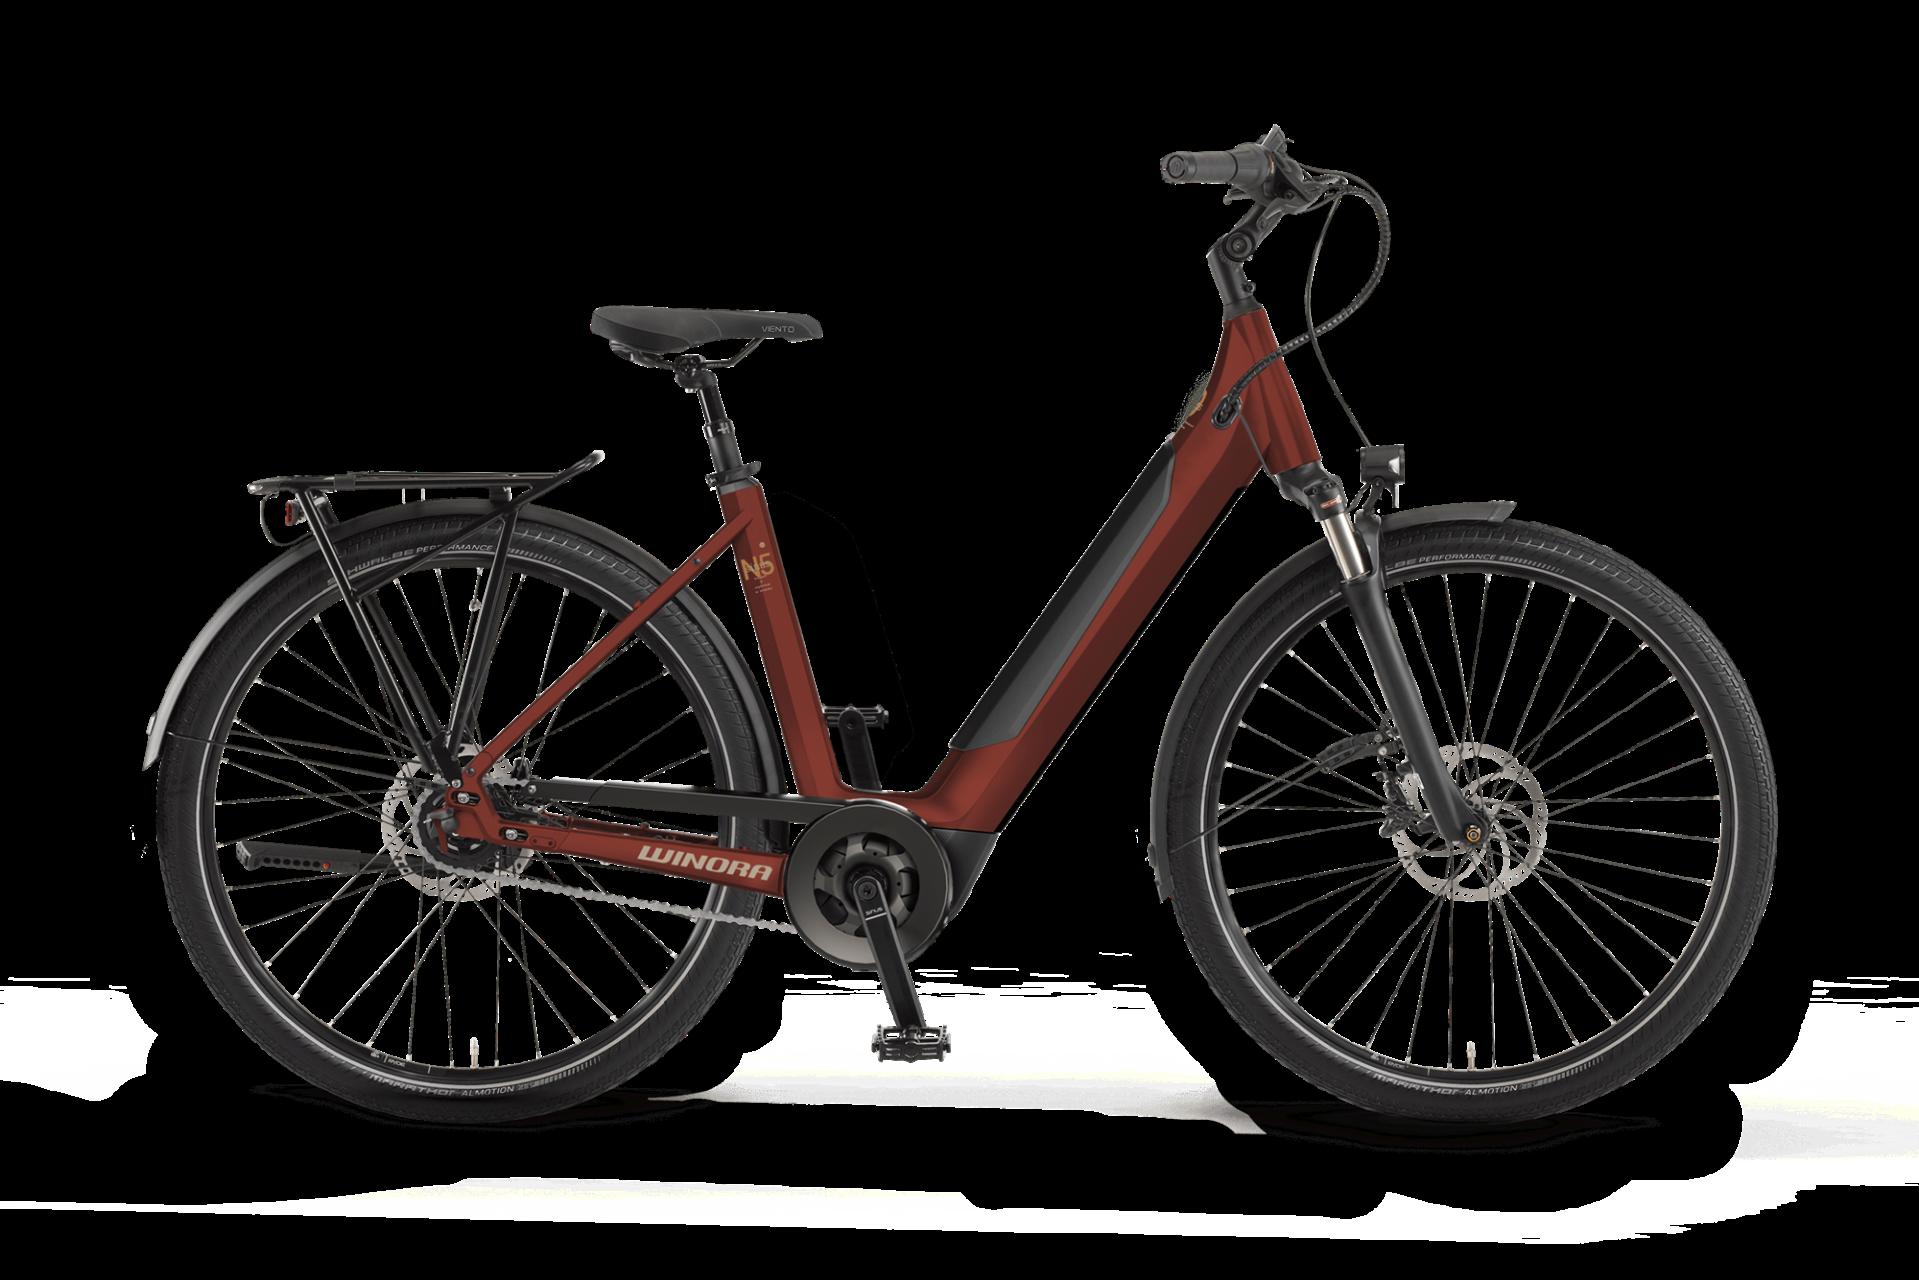 WINORA Sinus N5f Wave női trekking pedelec kerékpár - 54 cm (2021)